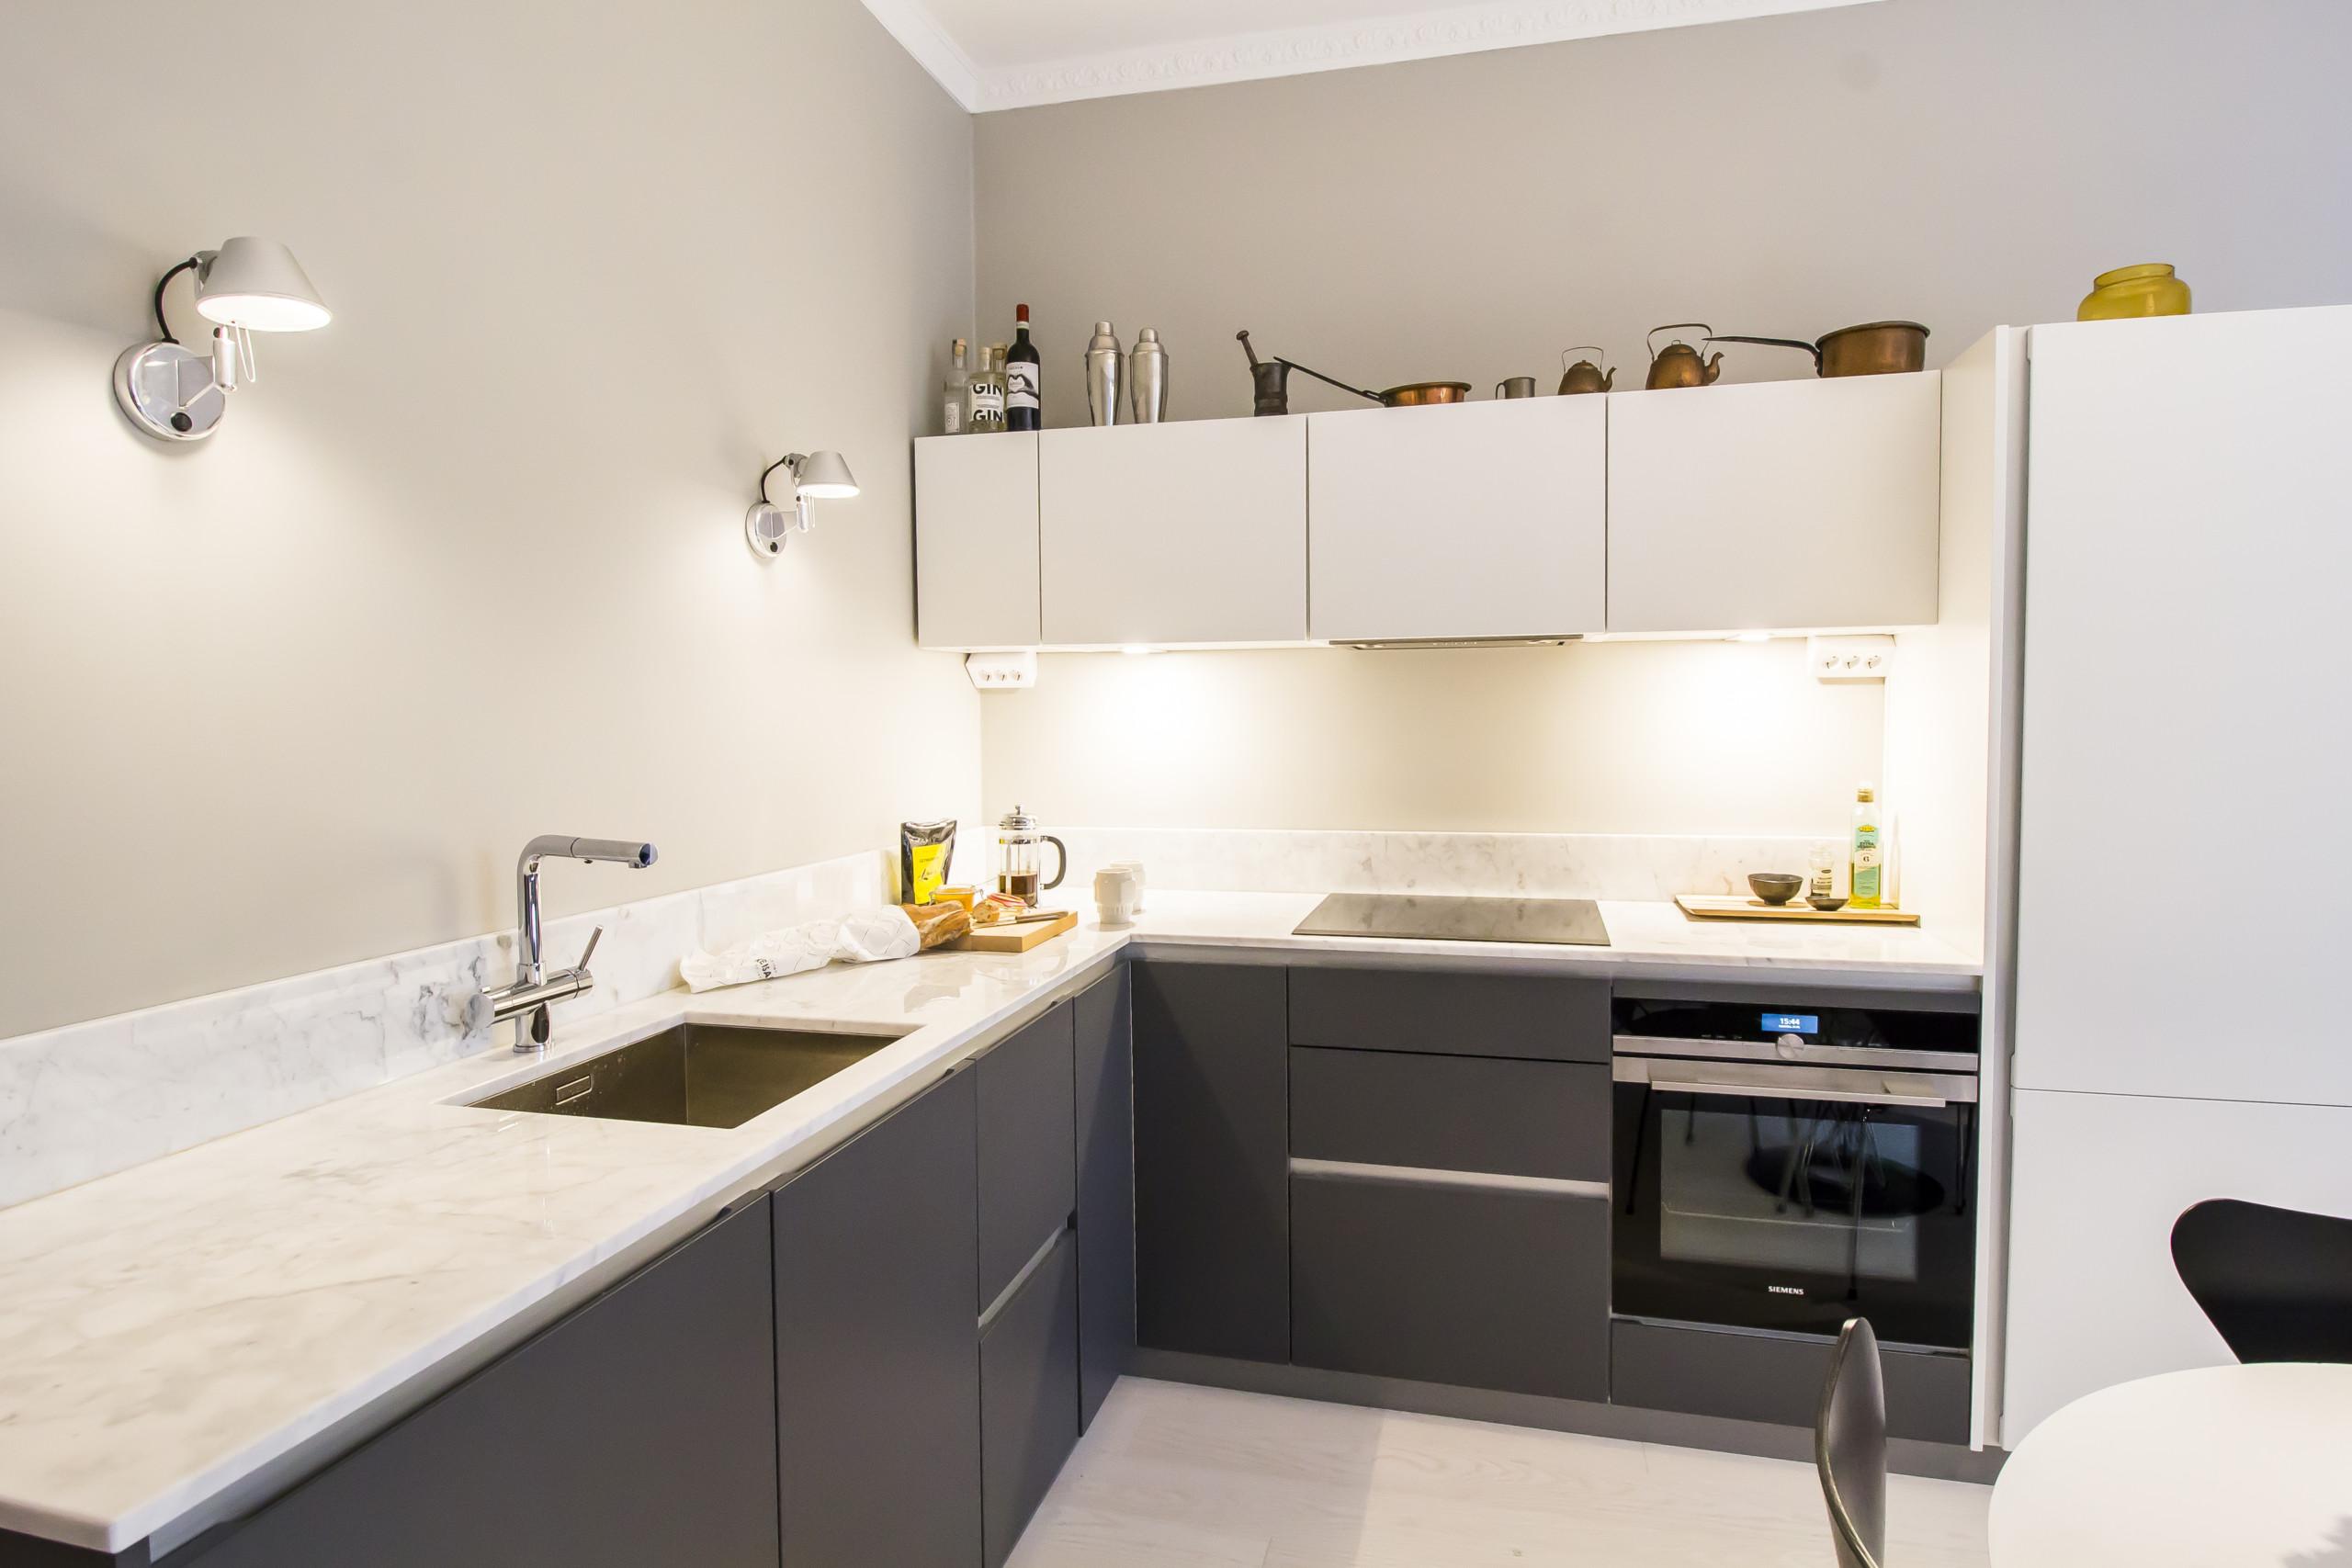 kaksion remontti, moderni uusi keittiö